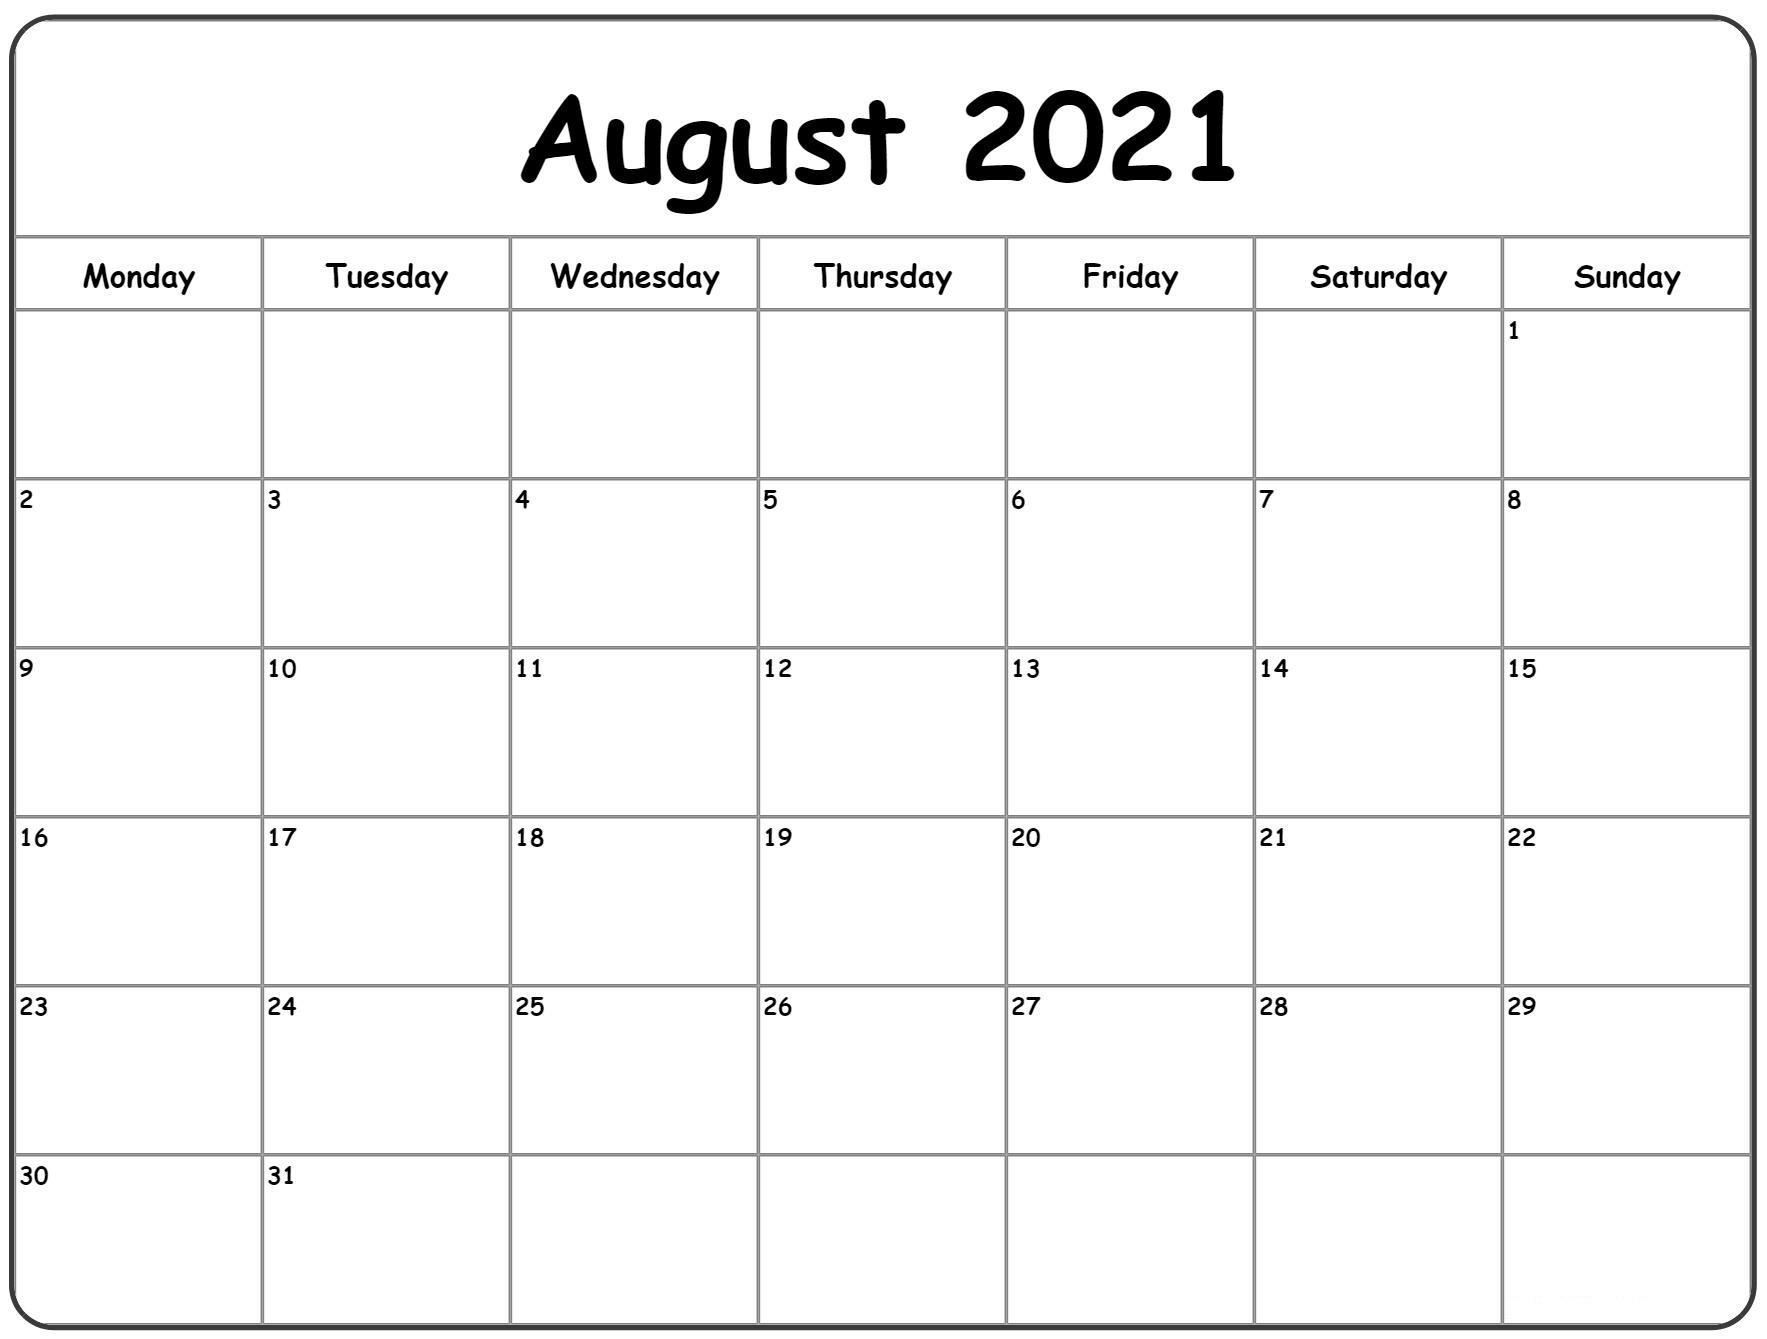 August 2021 Printable Calendar